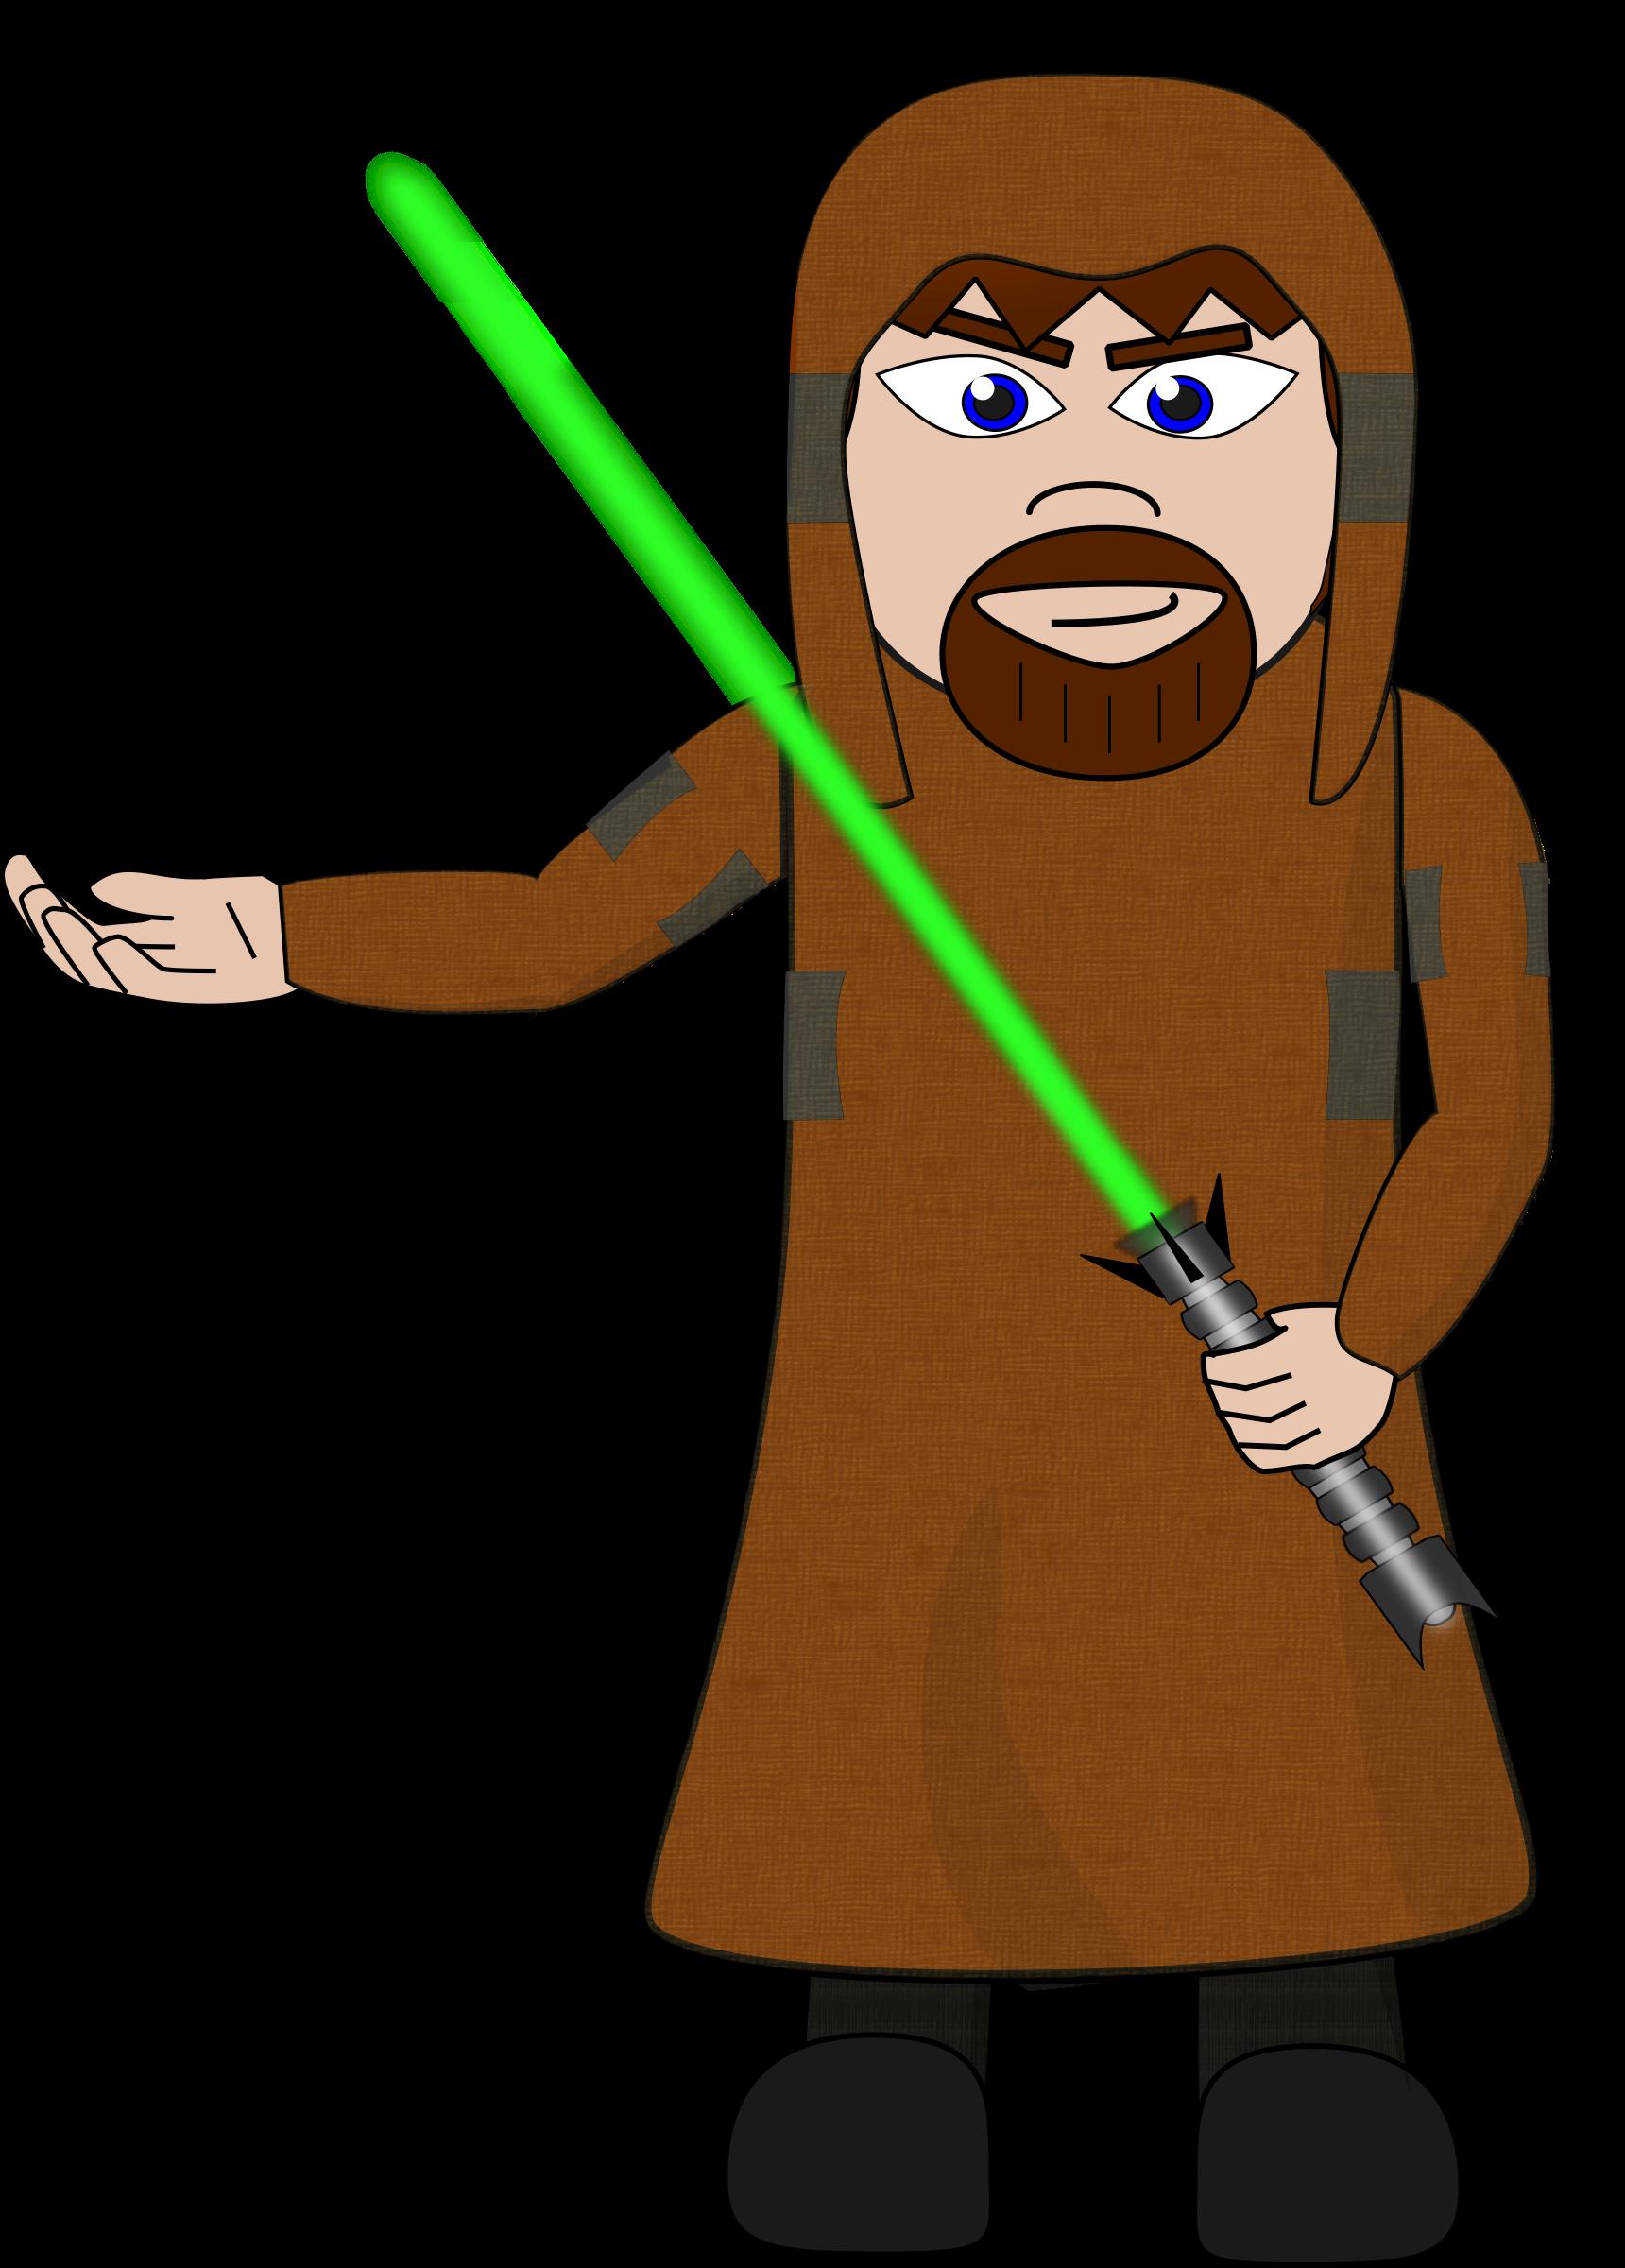 Laser sword salesman big. Knights clipart knighted